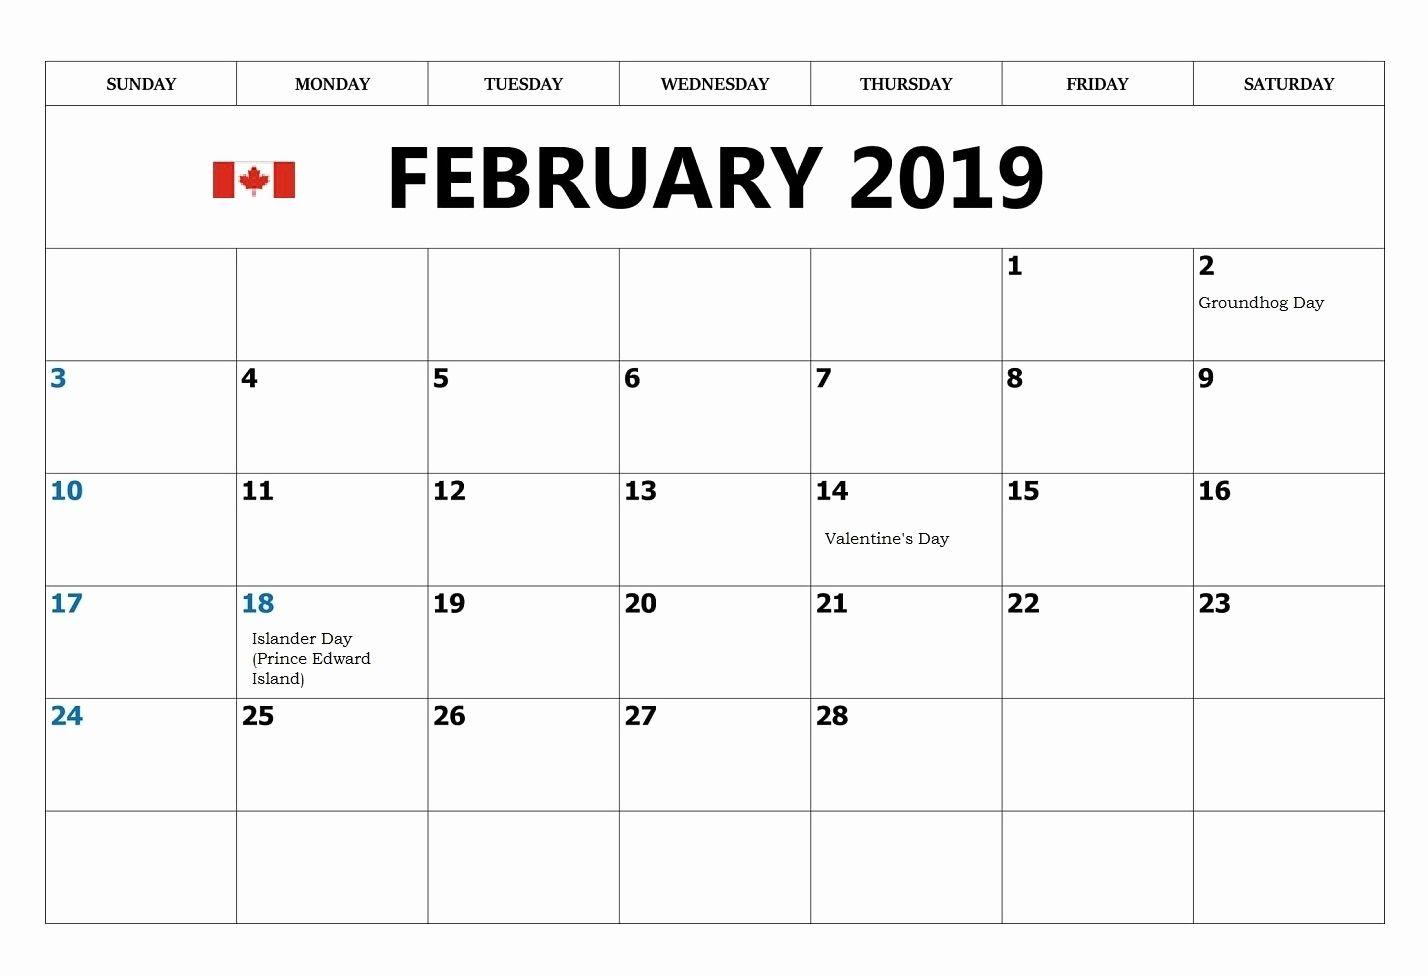 February 2019 Calendar Canada With Federal Holidays | 2019